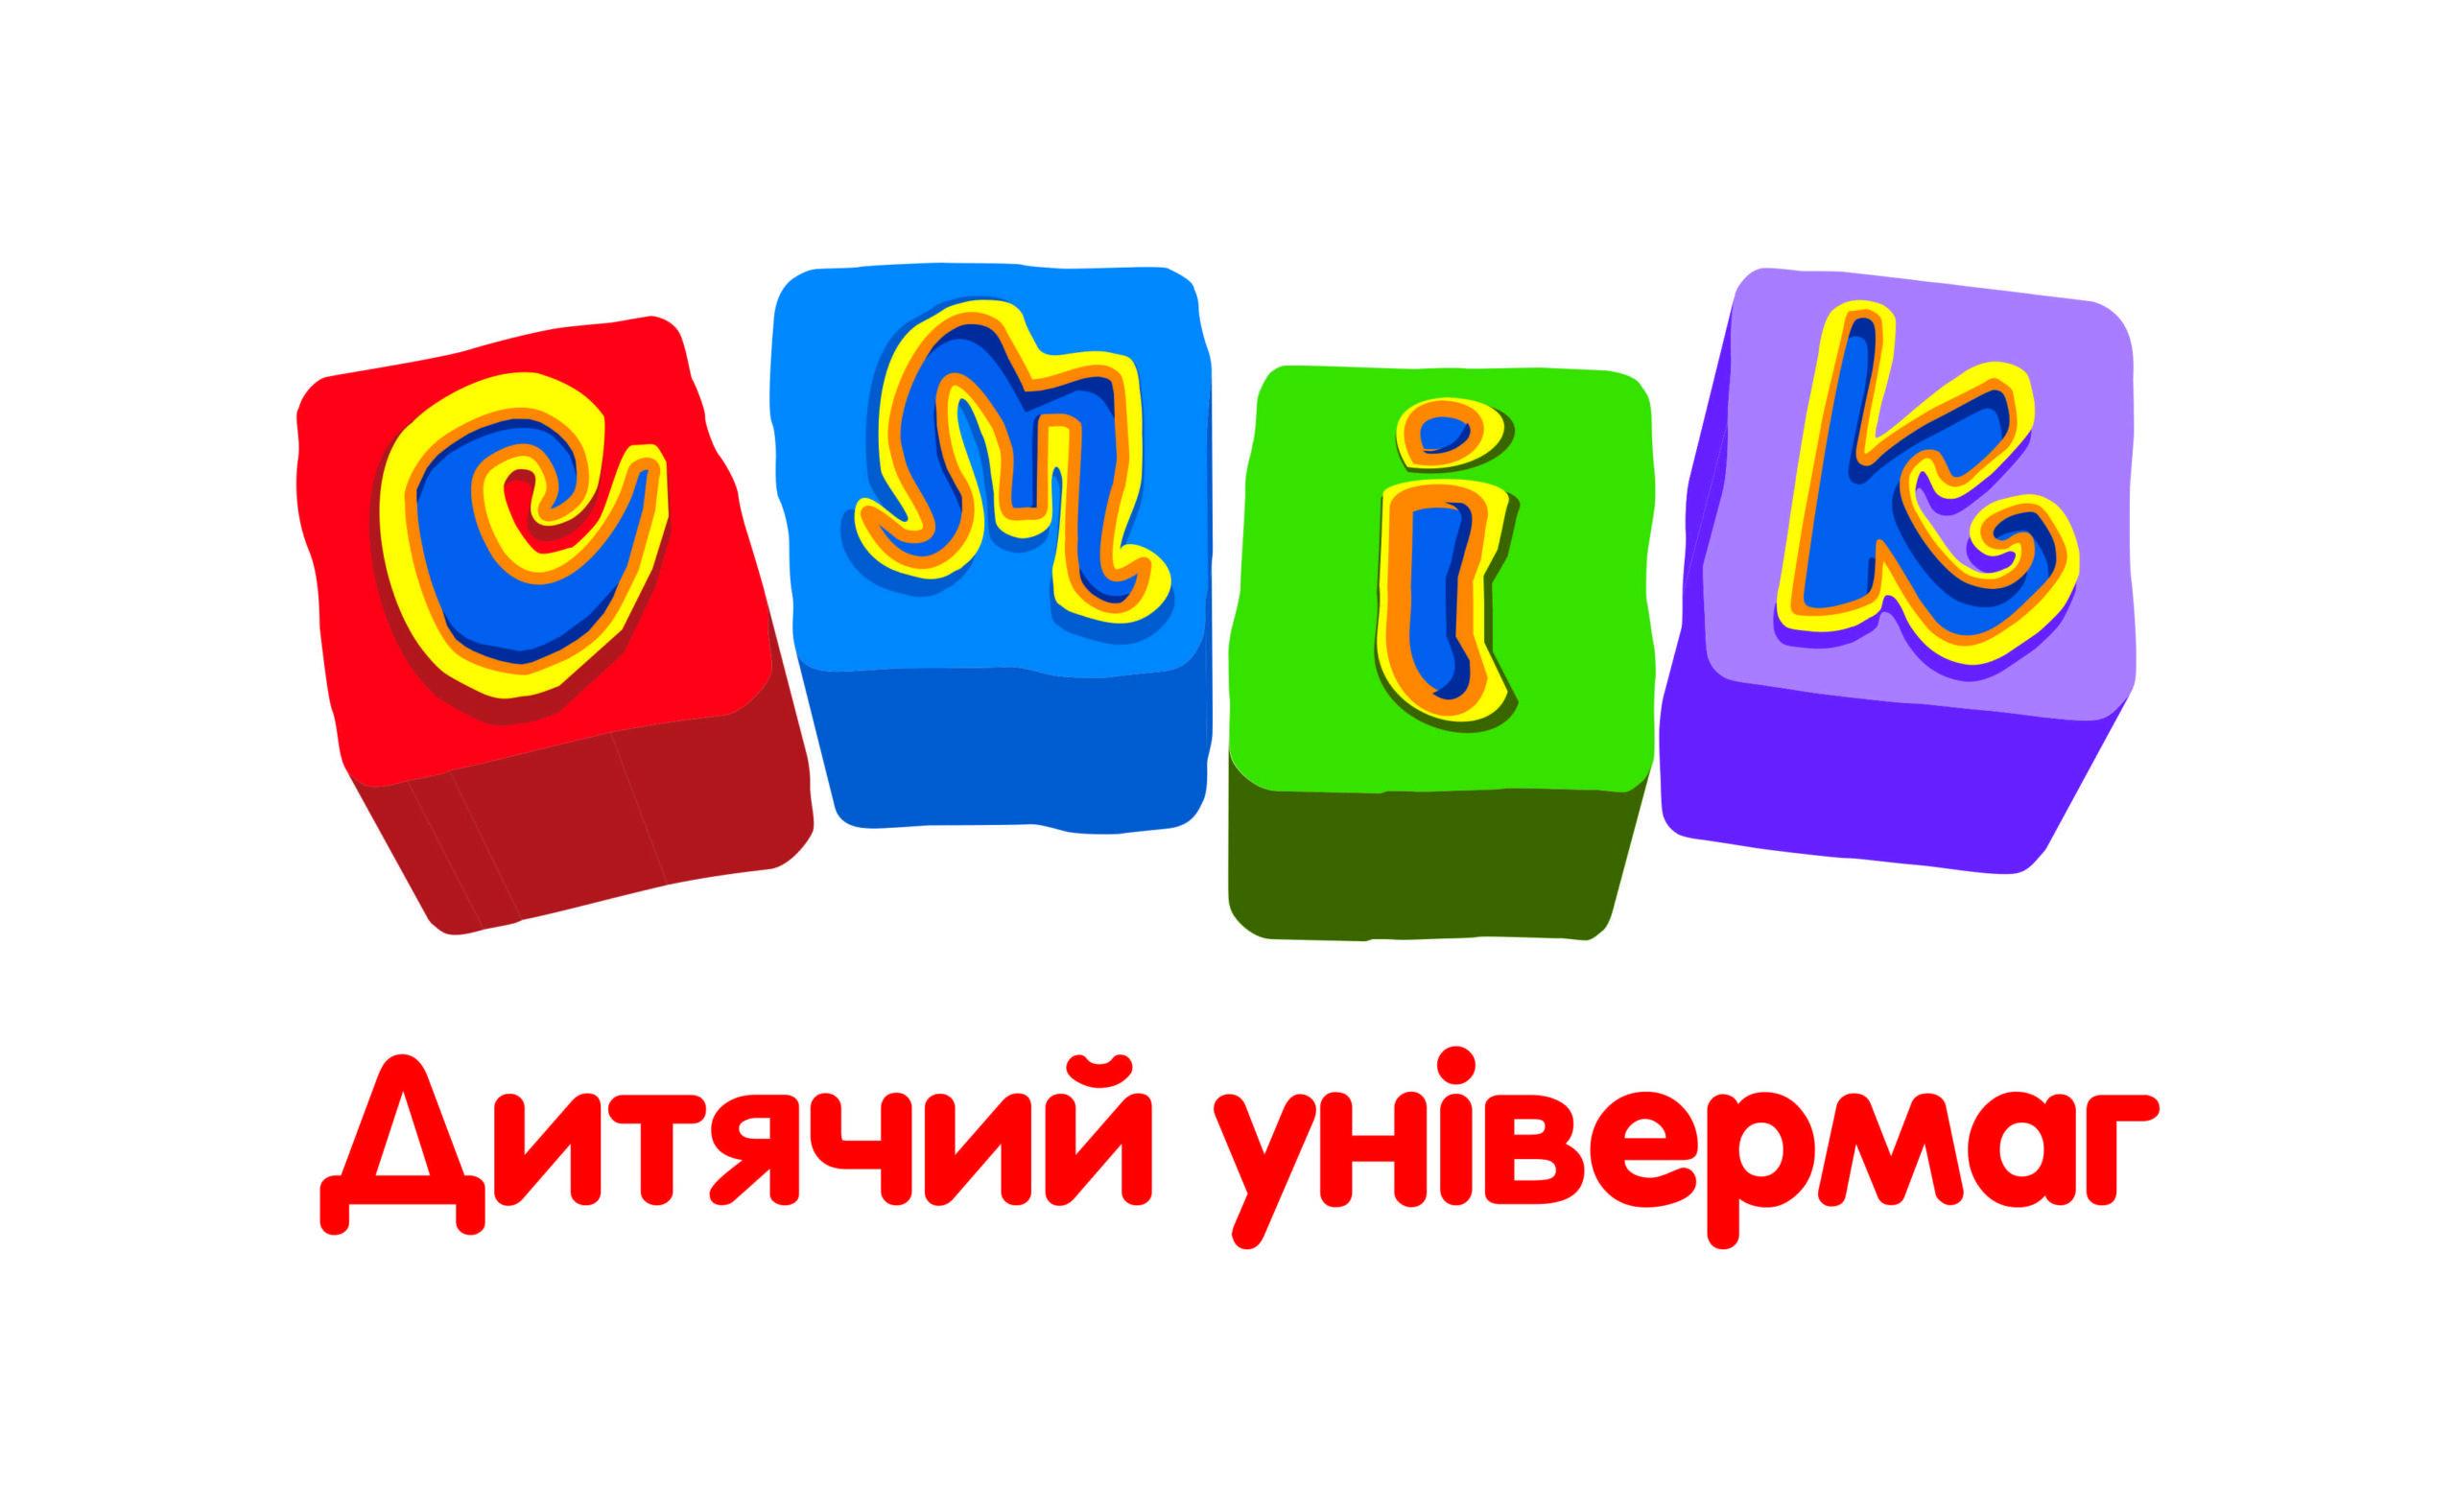 СМІК - kiev.karavan.com.ua